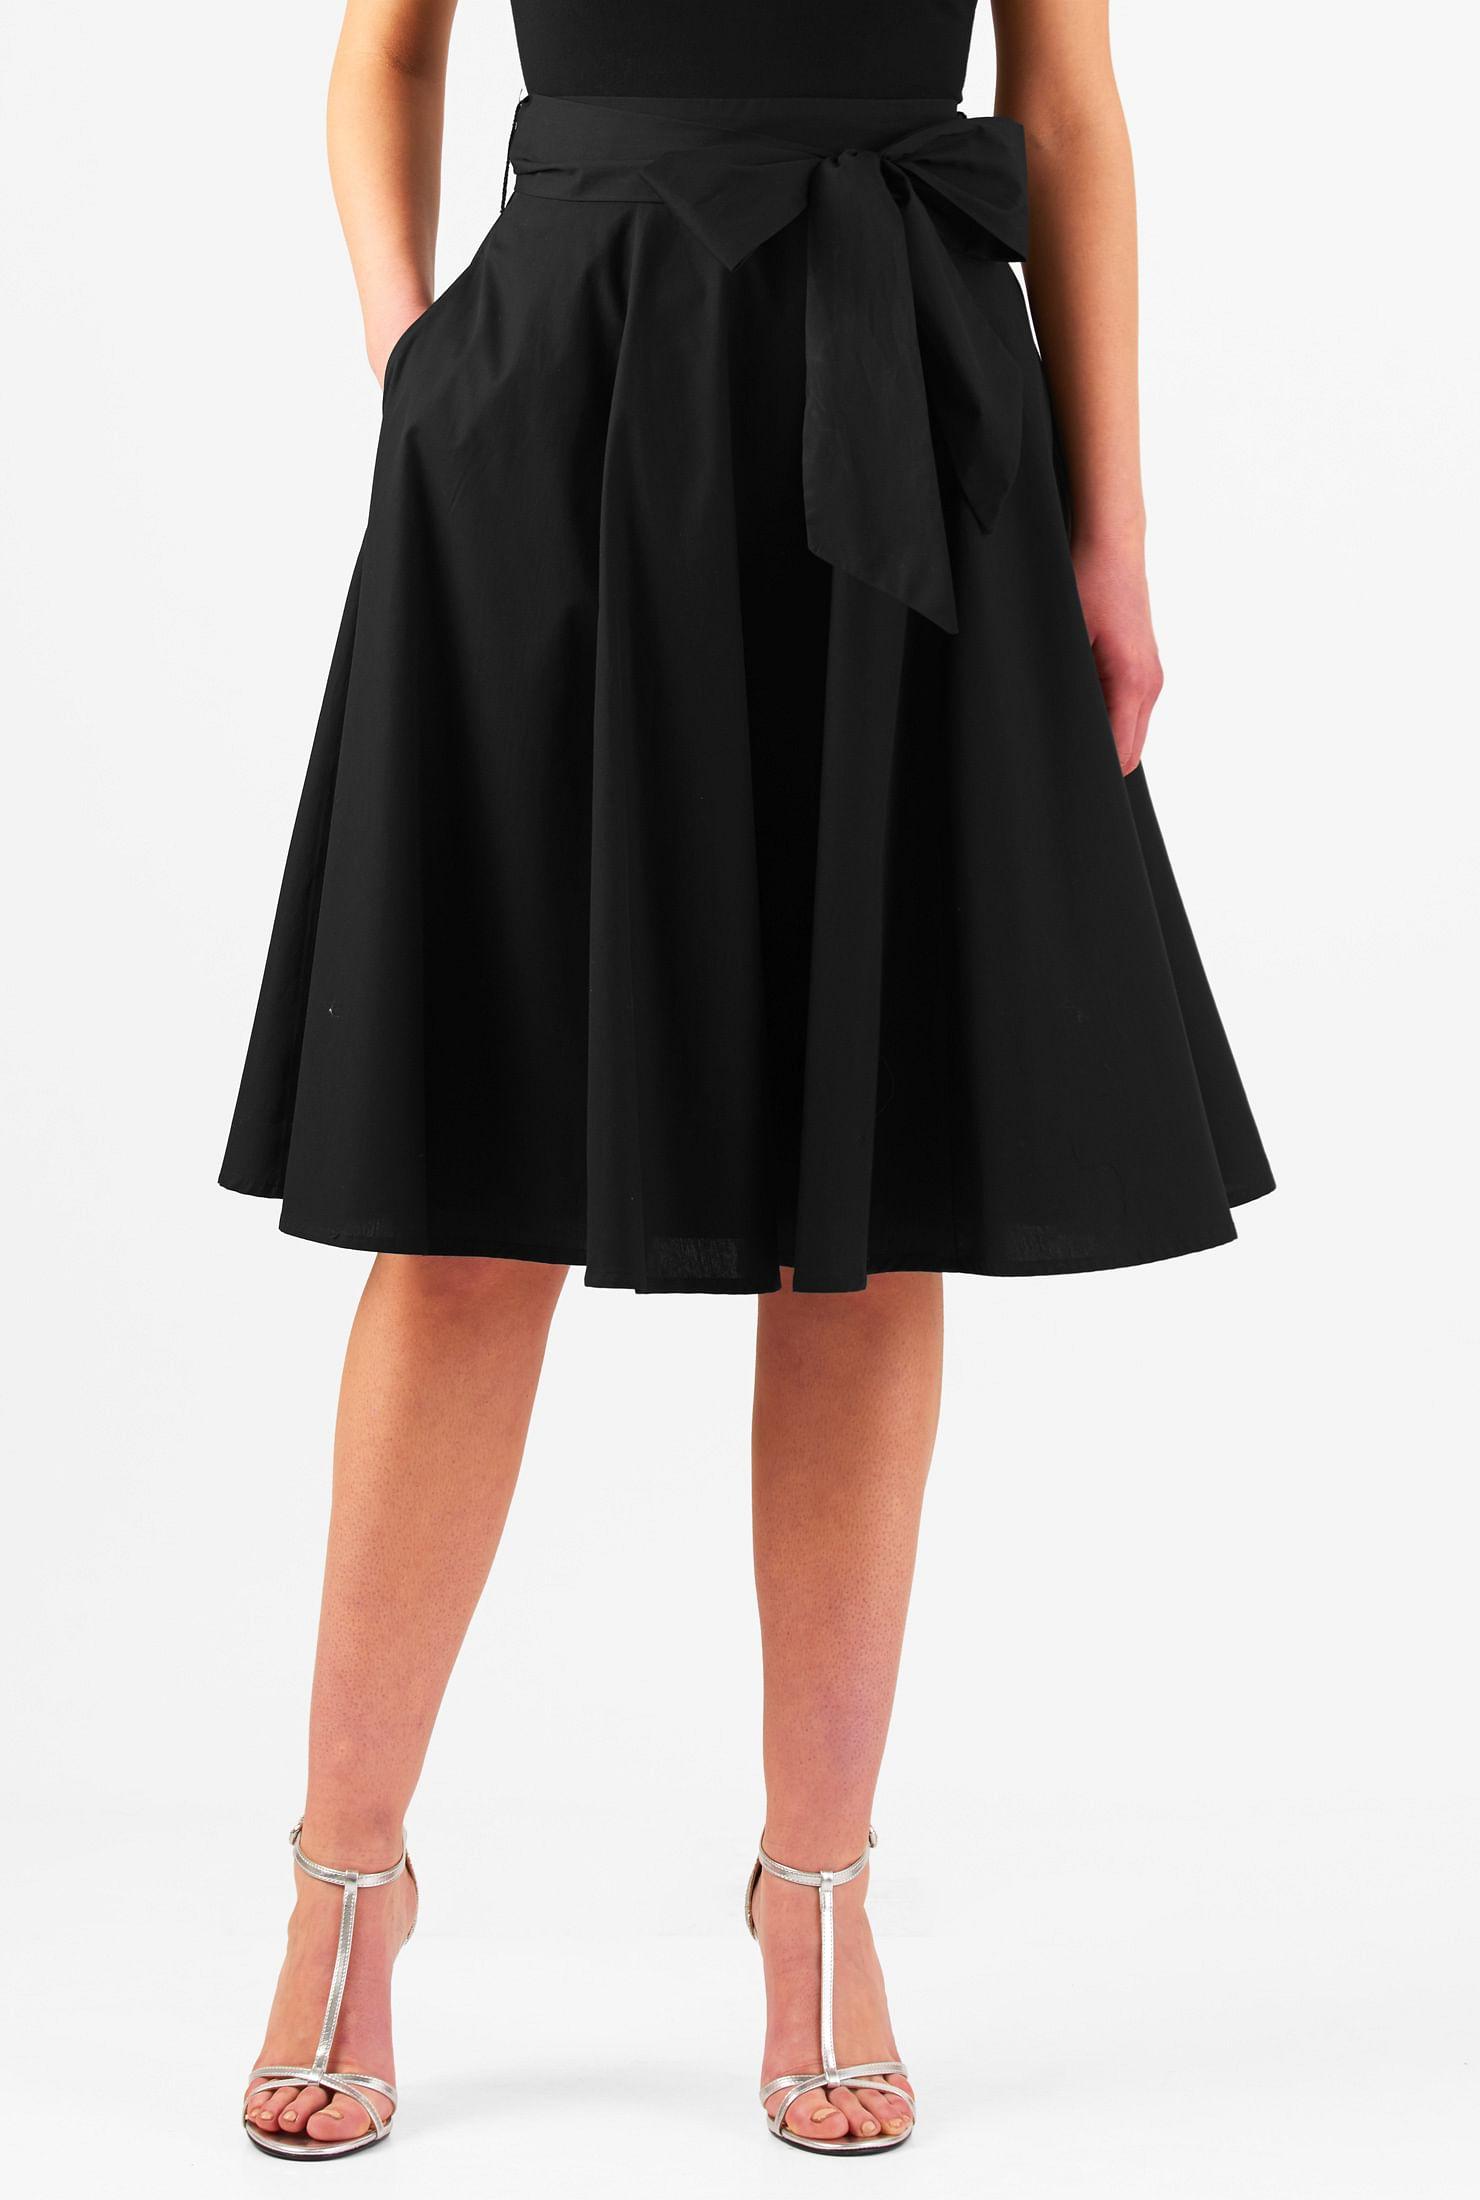 7644298c73 banded waist skirts, below knee length skirts, Black Skirts, cotton skirts,